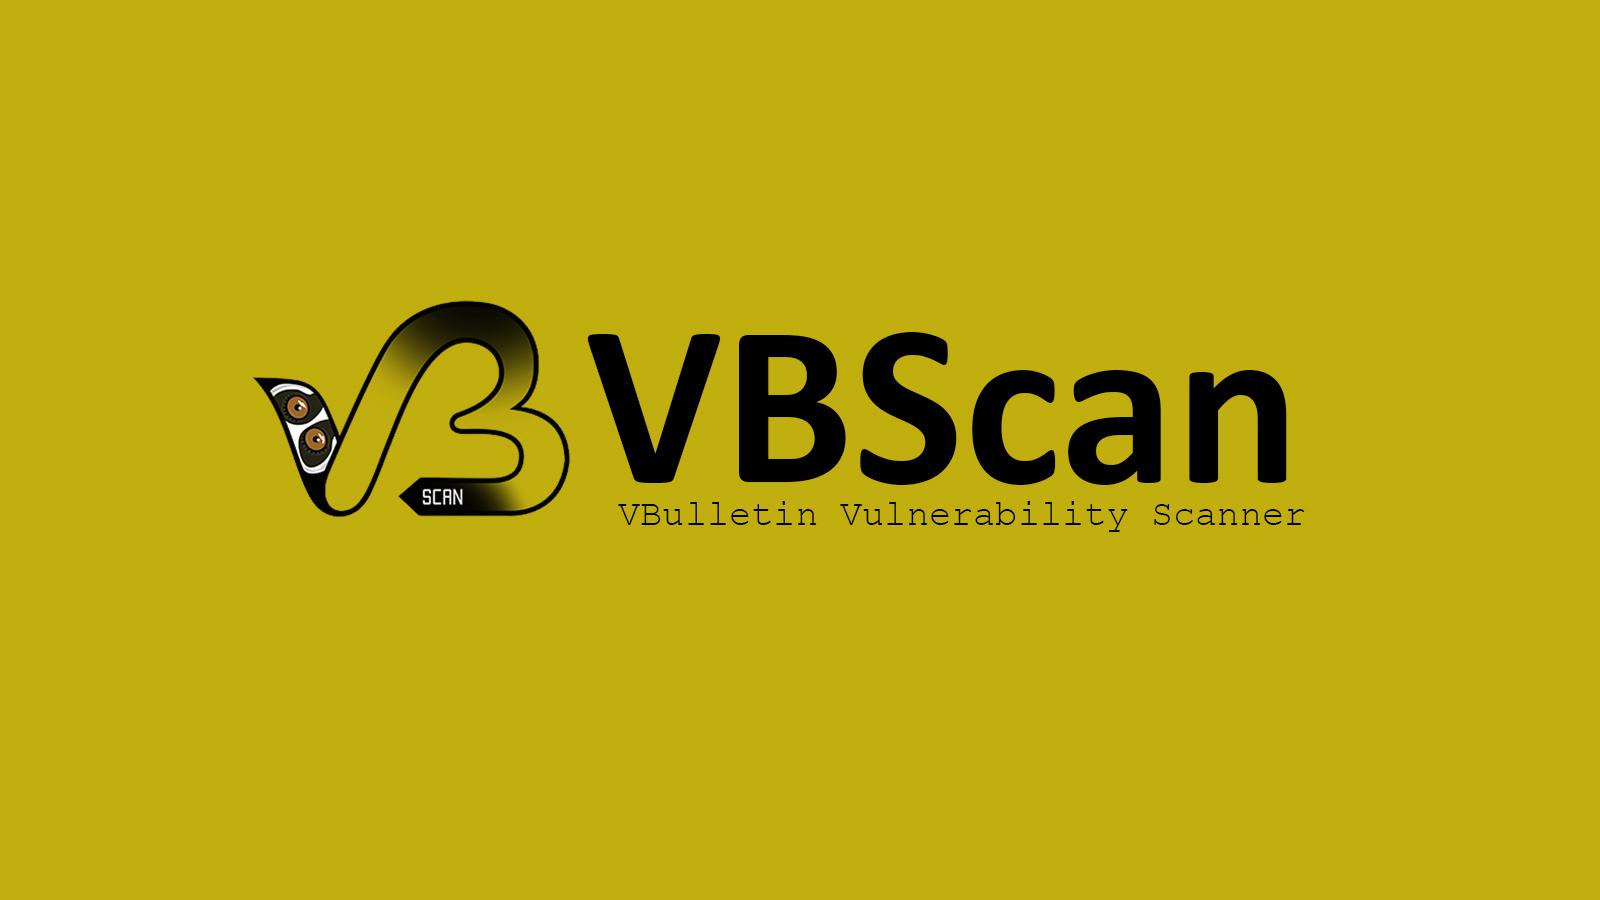 VBScan - VBulletin Vulnerability Scanner